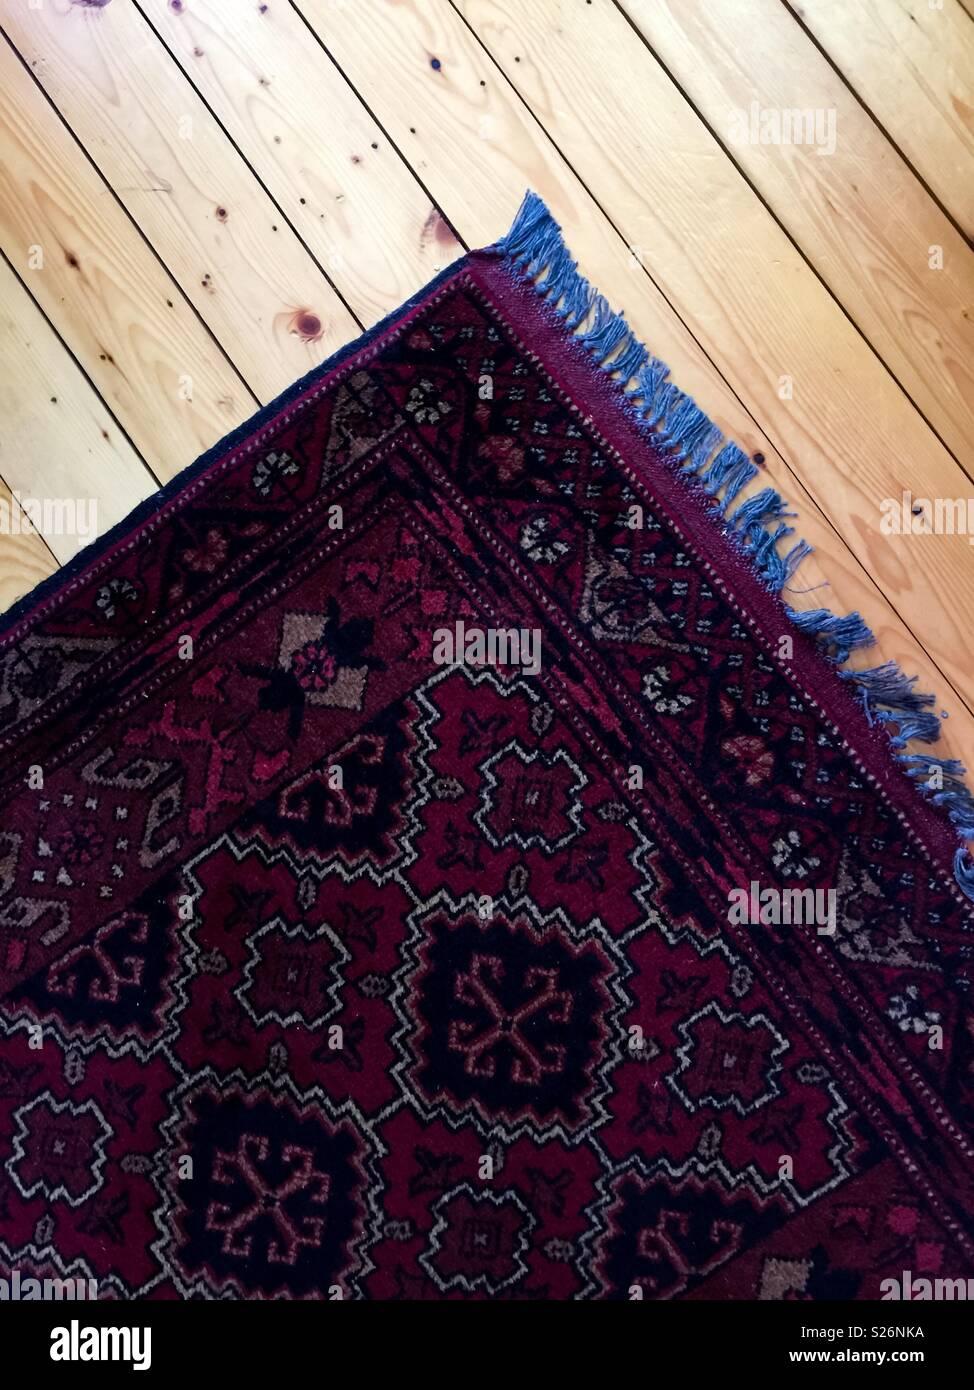 Oriental rug on pine floor - Stock Image